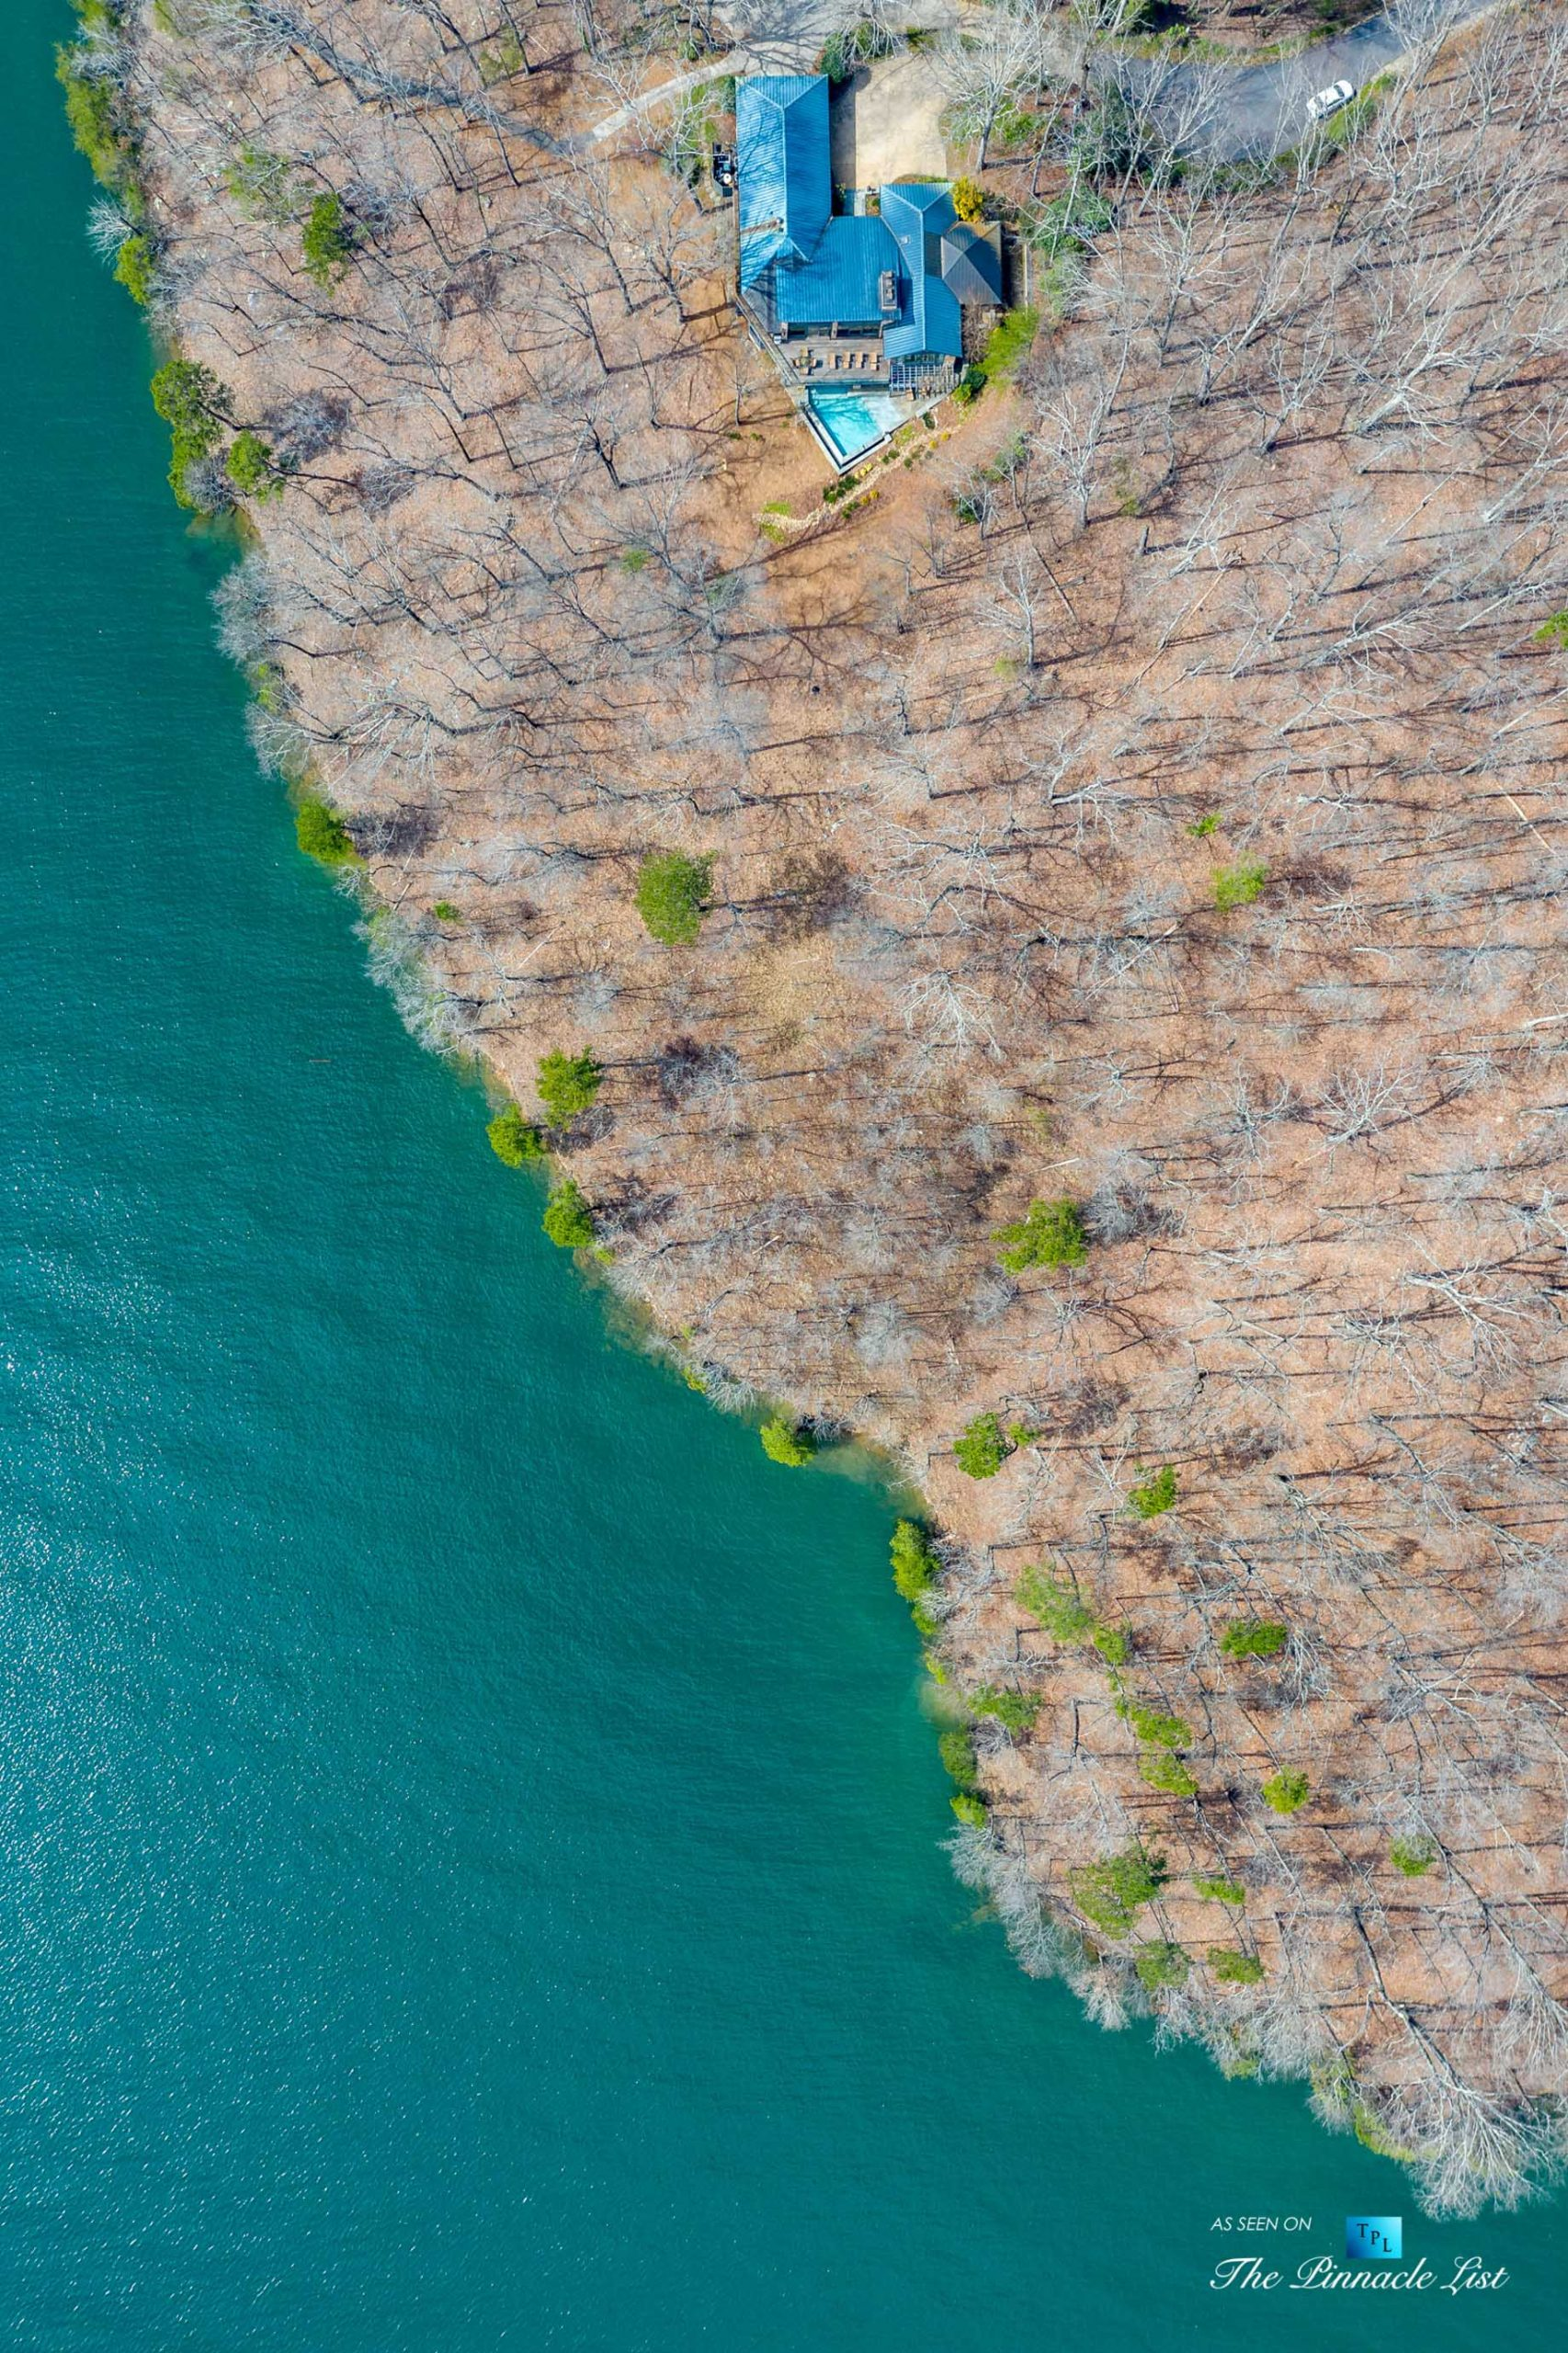 7860 Chestnut Hill Rd, Cumming, GA, USA – Drone Overhead Aerial View – Luxury Real Estate – Lake Lanier Mid-Century Modern Stone Home